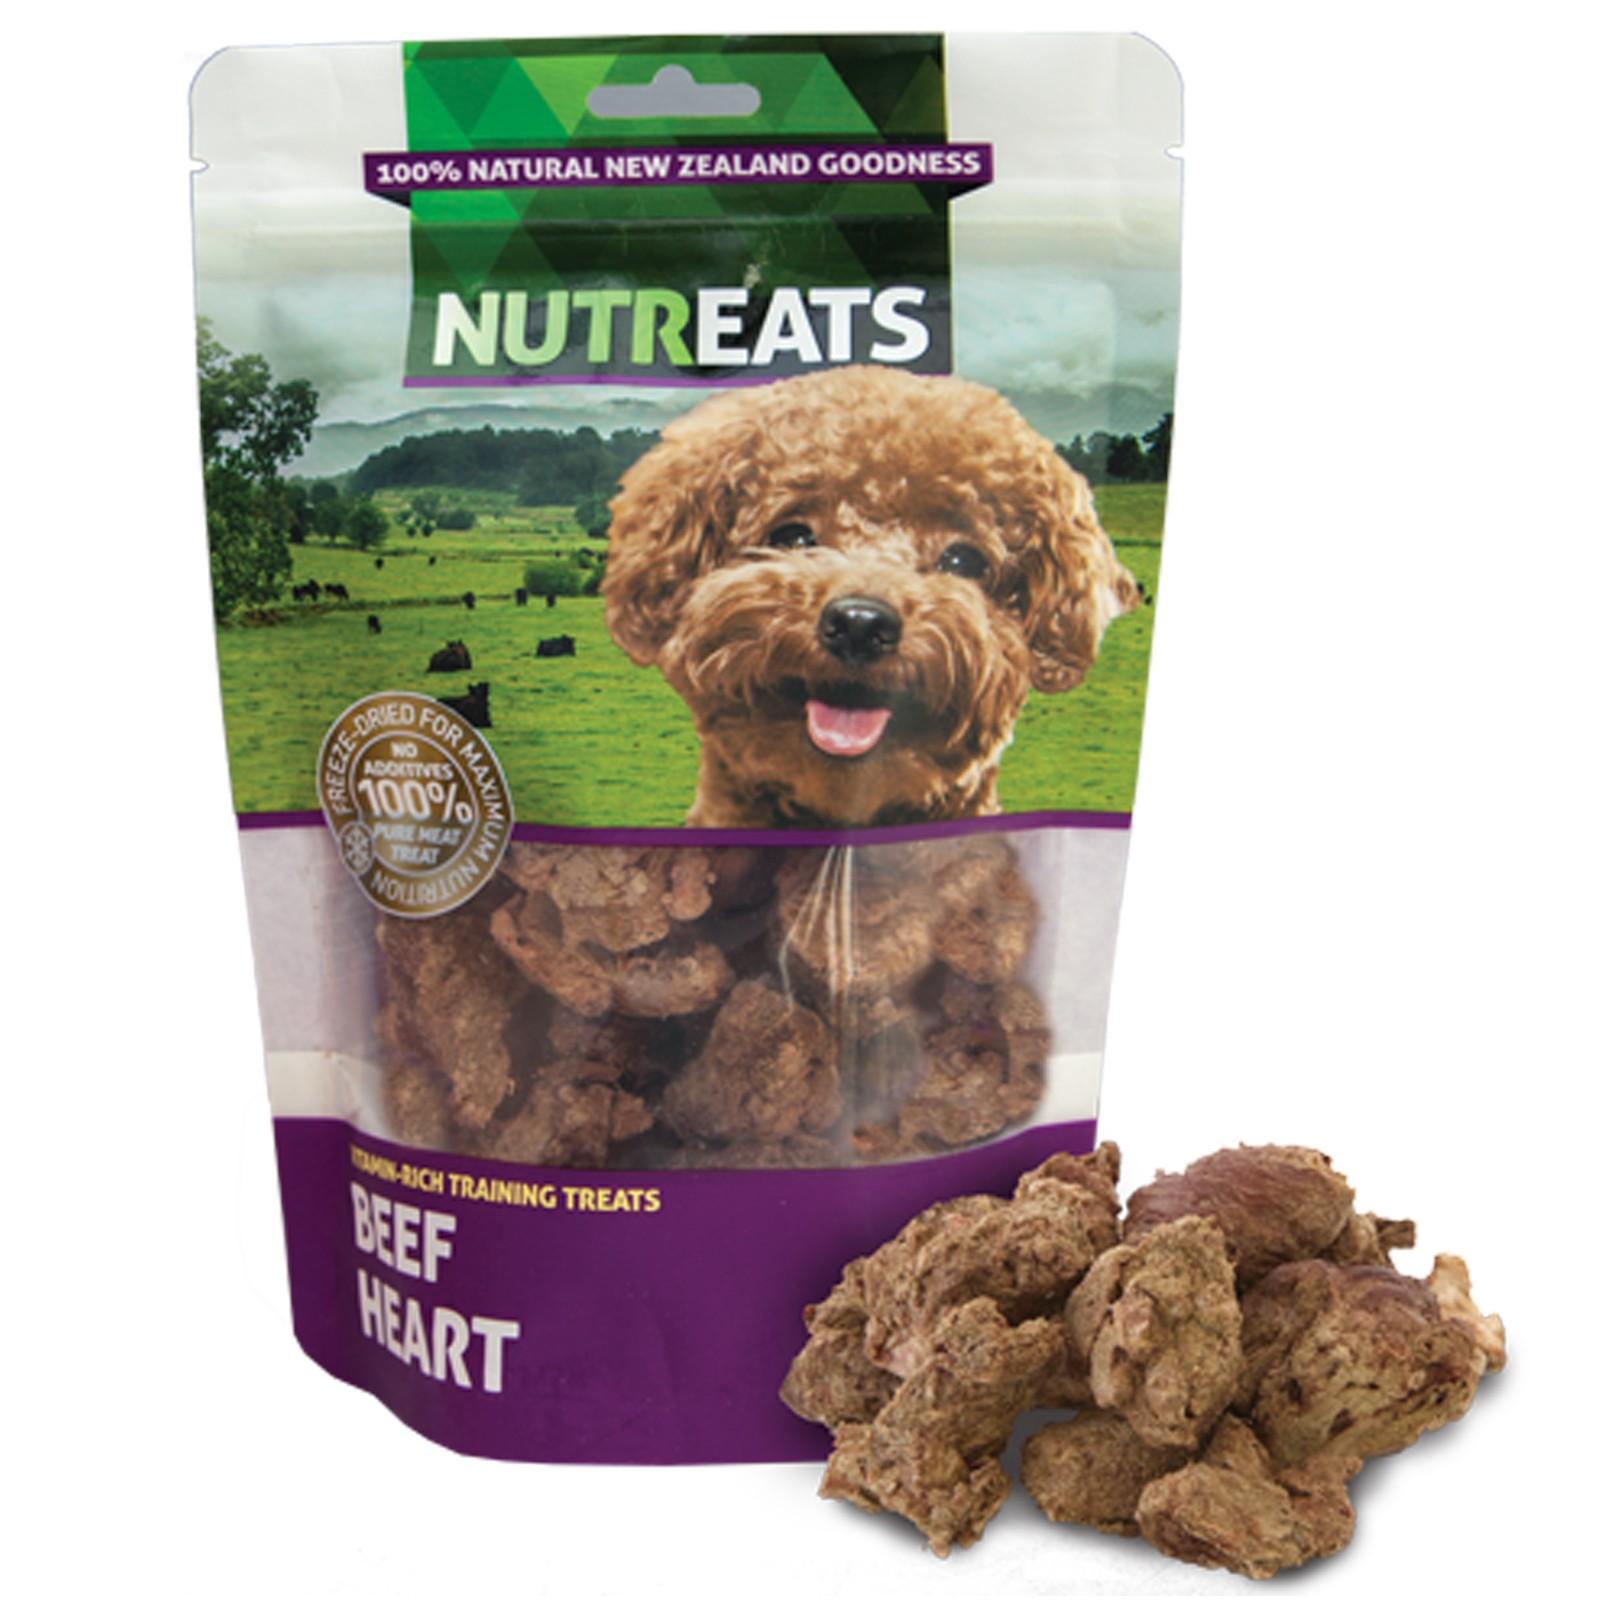 Nutreats 100% Natural Dog Treats Beef Heart 50gm